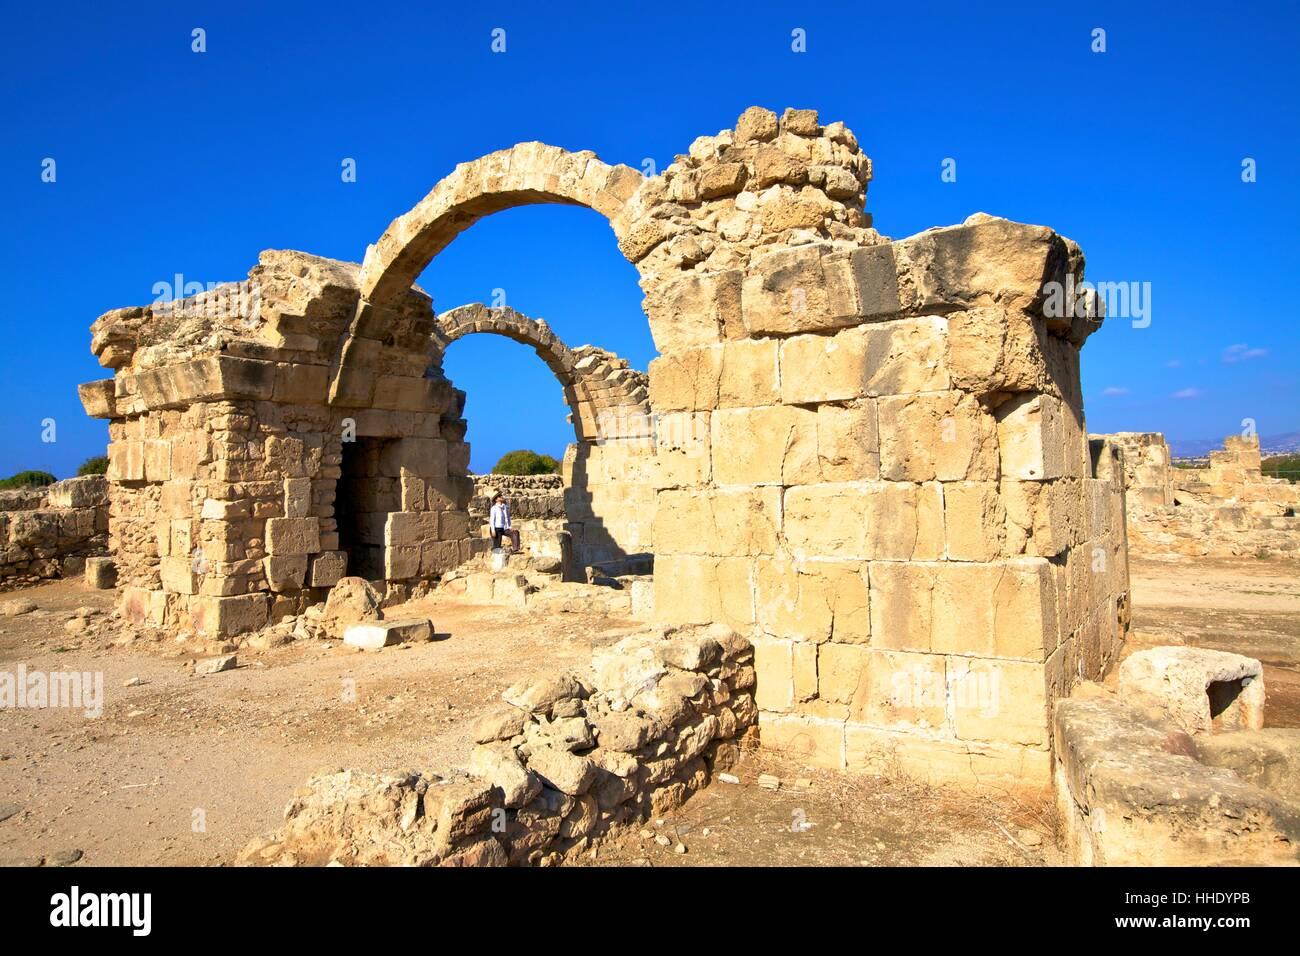 Saranda Kolones, Kato Paphos Archaeological Park, UNESCO, Paphos, Cyprus, Eastern Mediterranean - Stock Image